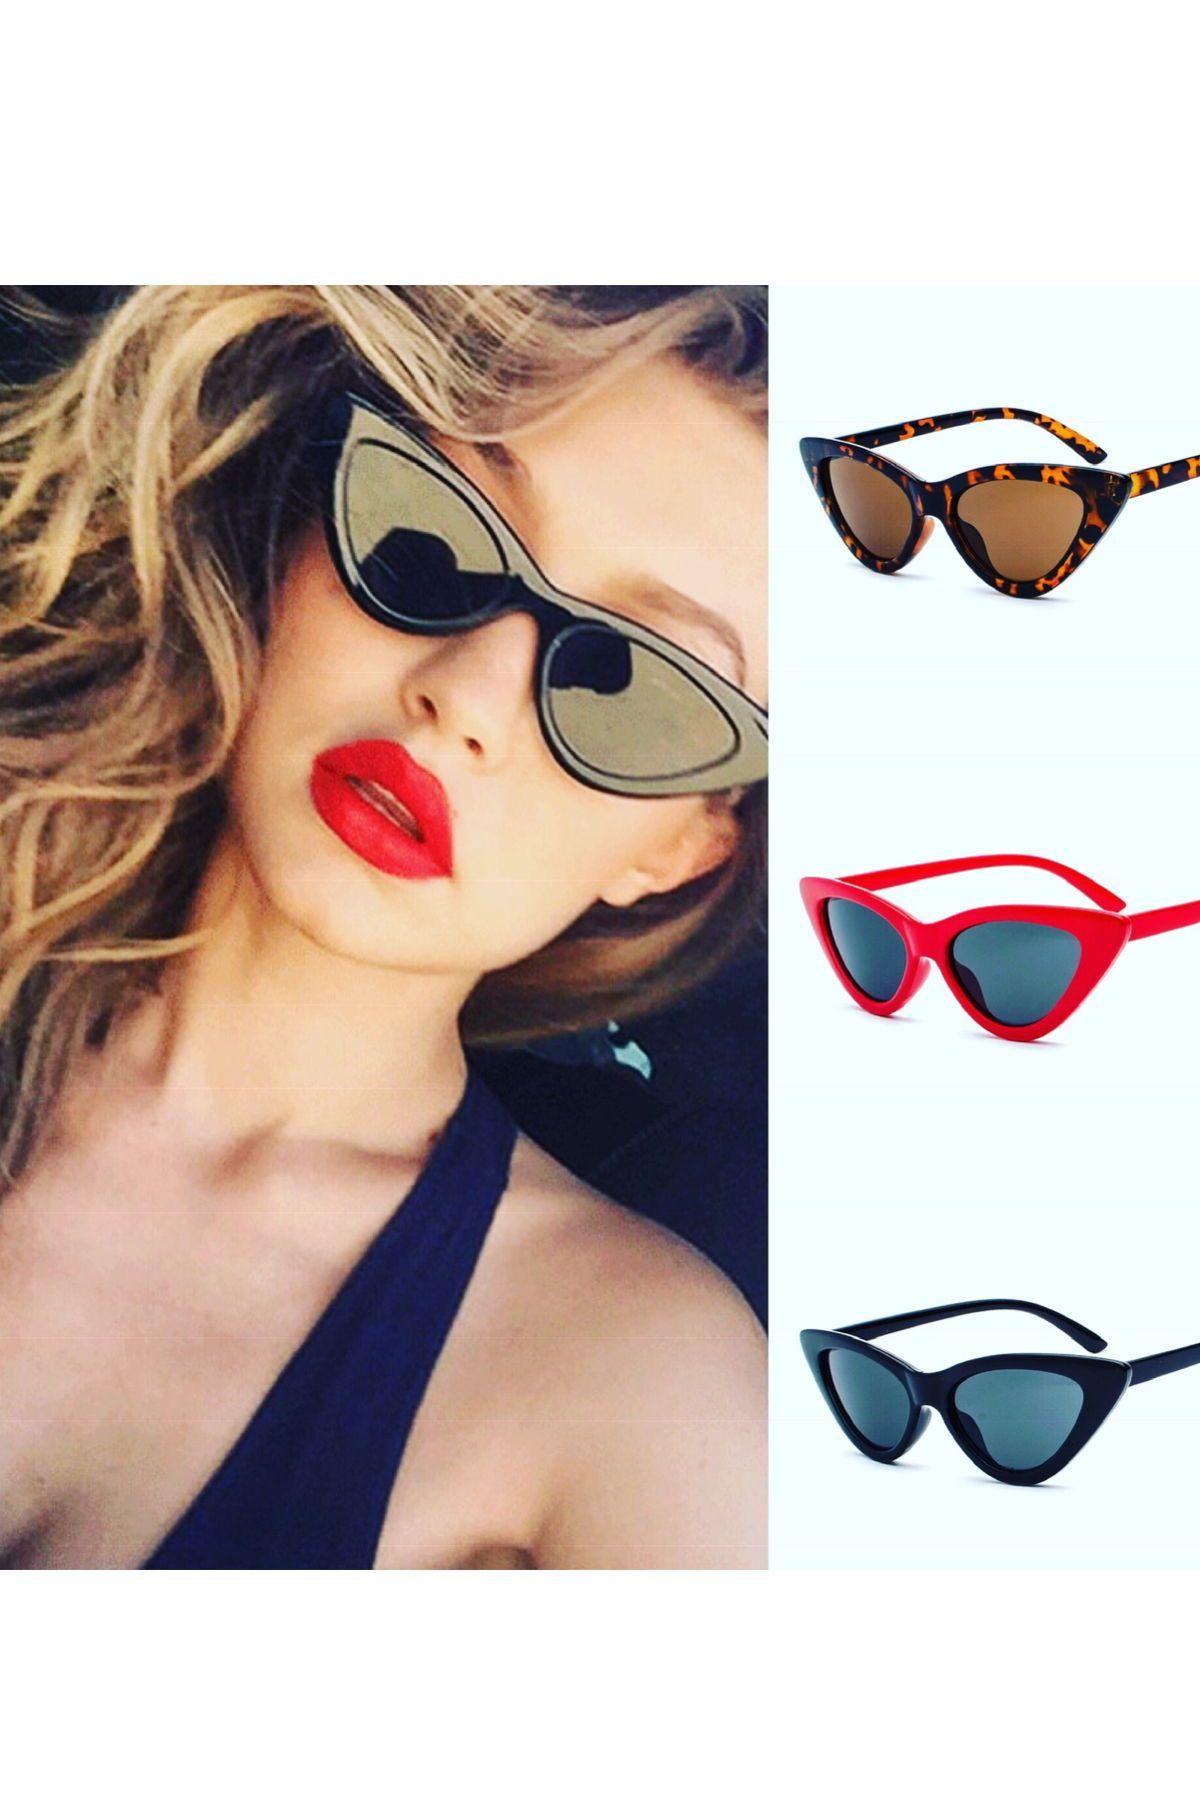 d4a0792b021 Unique Stylish Triangle Cat Eye Designer Inspired Sunglasses Gift for Women  Ladies Shades Retro Vintage Eyewear